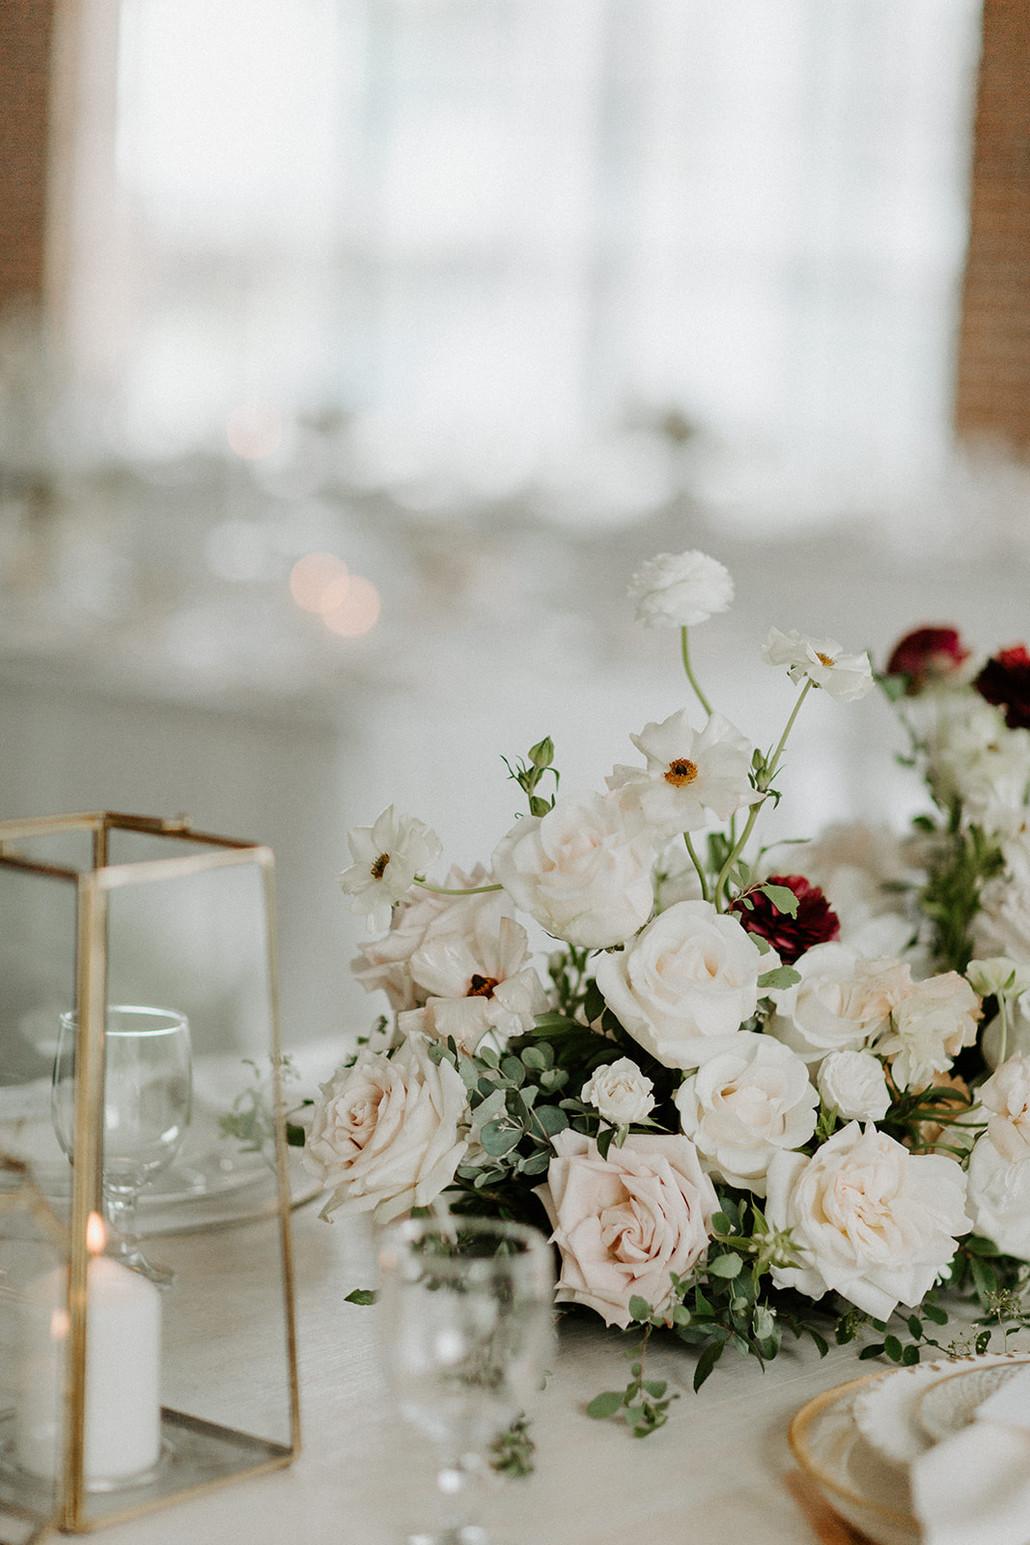 charmaine_ben_wedding_0508_websize.jpg